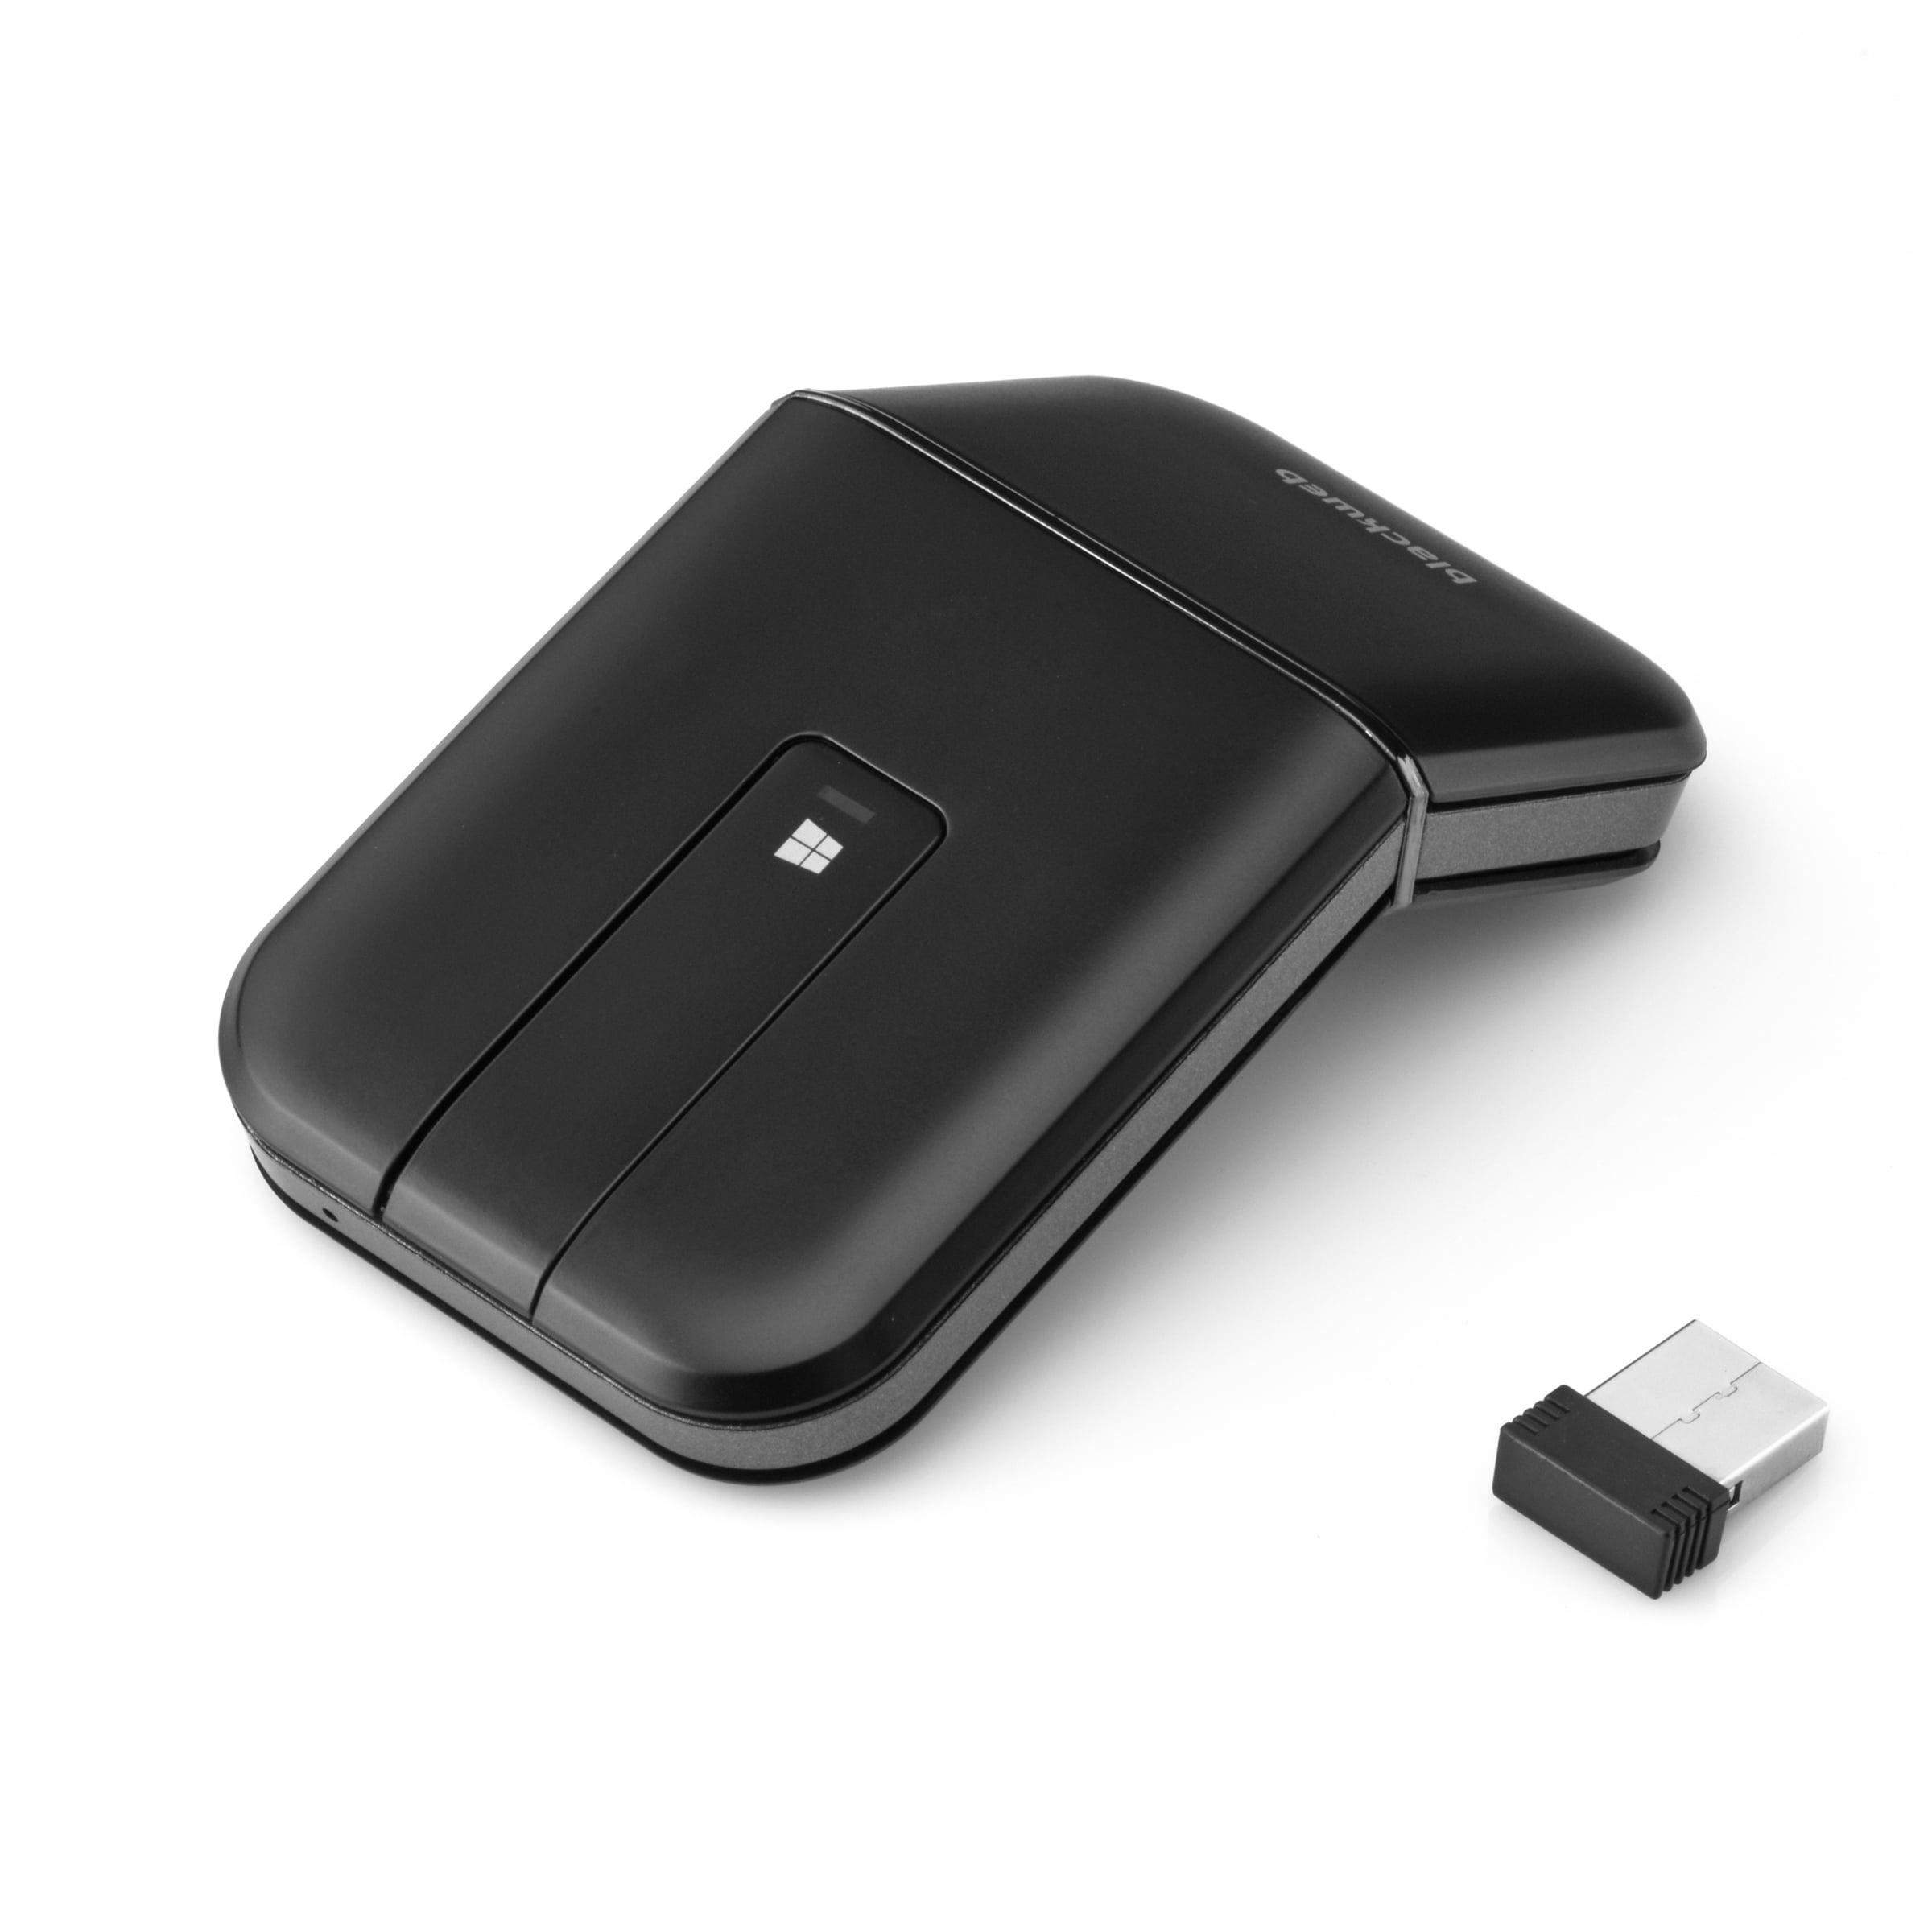 86a80d69c2f BlackWeb Wireless Bluetooth Touch Mouse. 75 ft. Range - Walmart.com